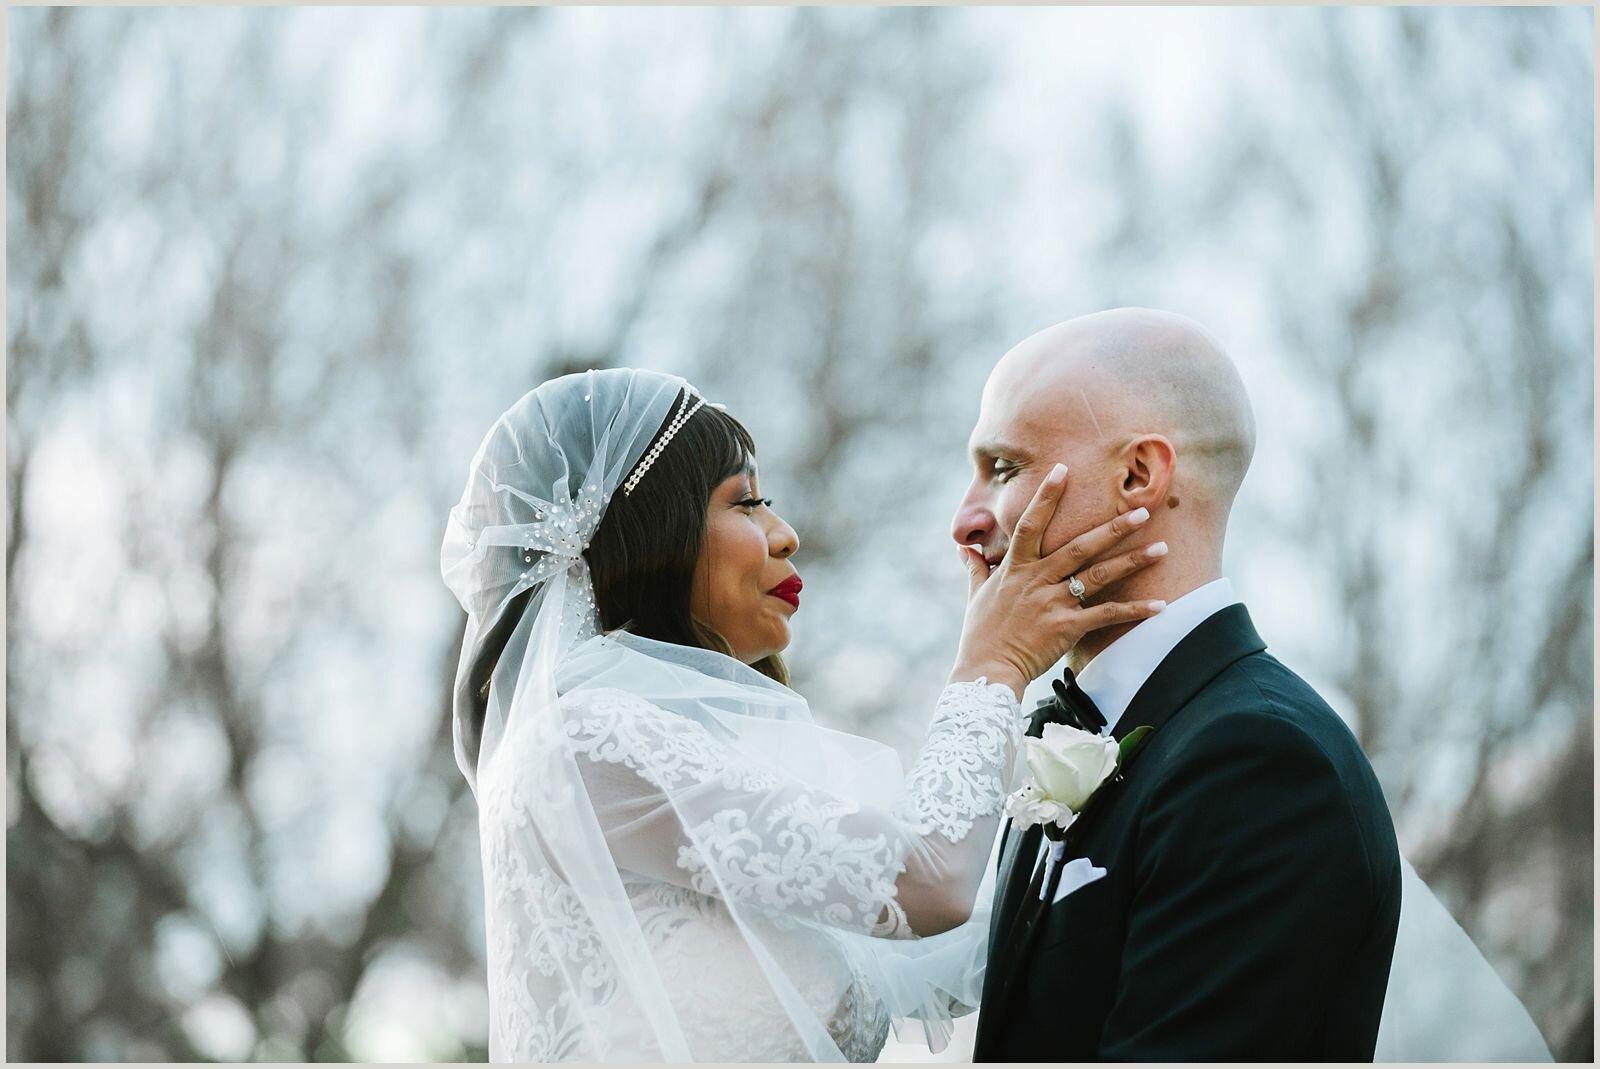 joseph_koprek_wedding_melbourne_the_prince_deck_0065.jpg